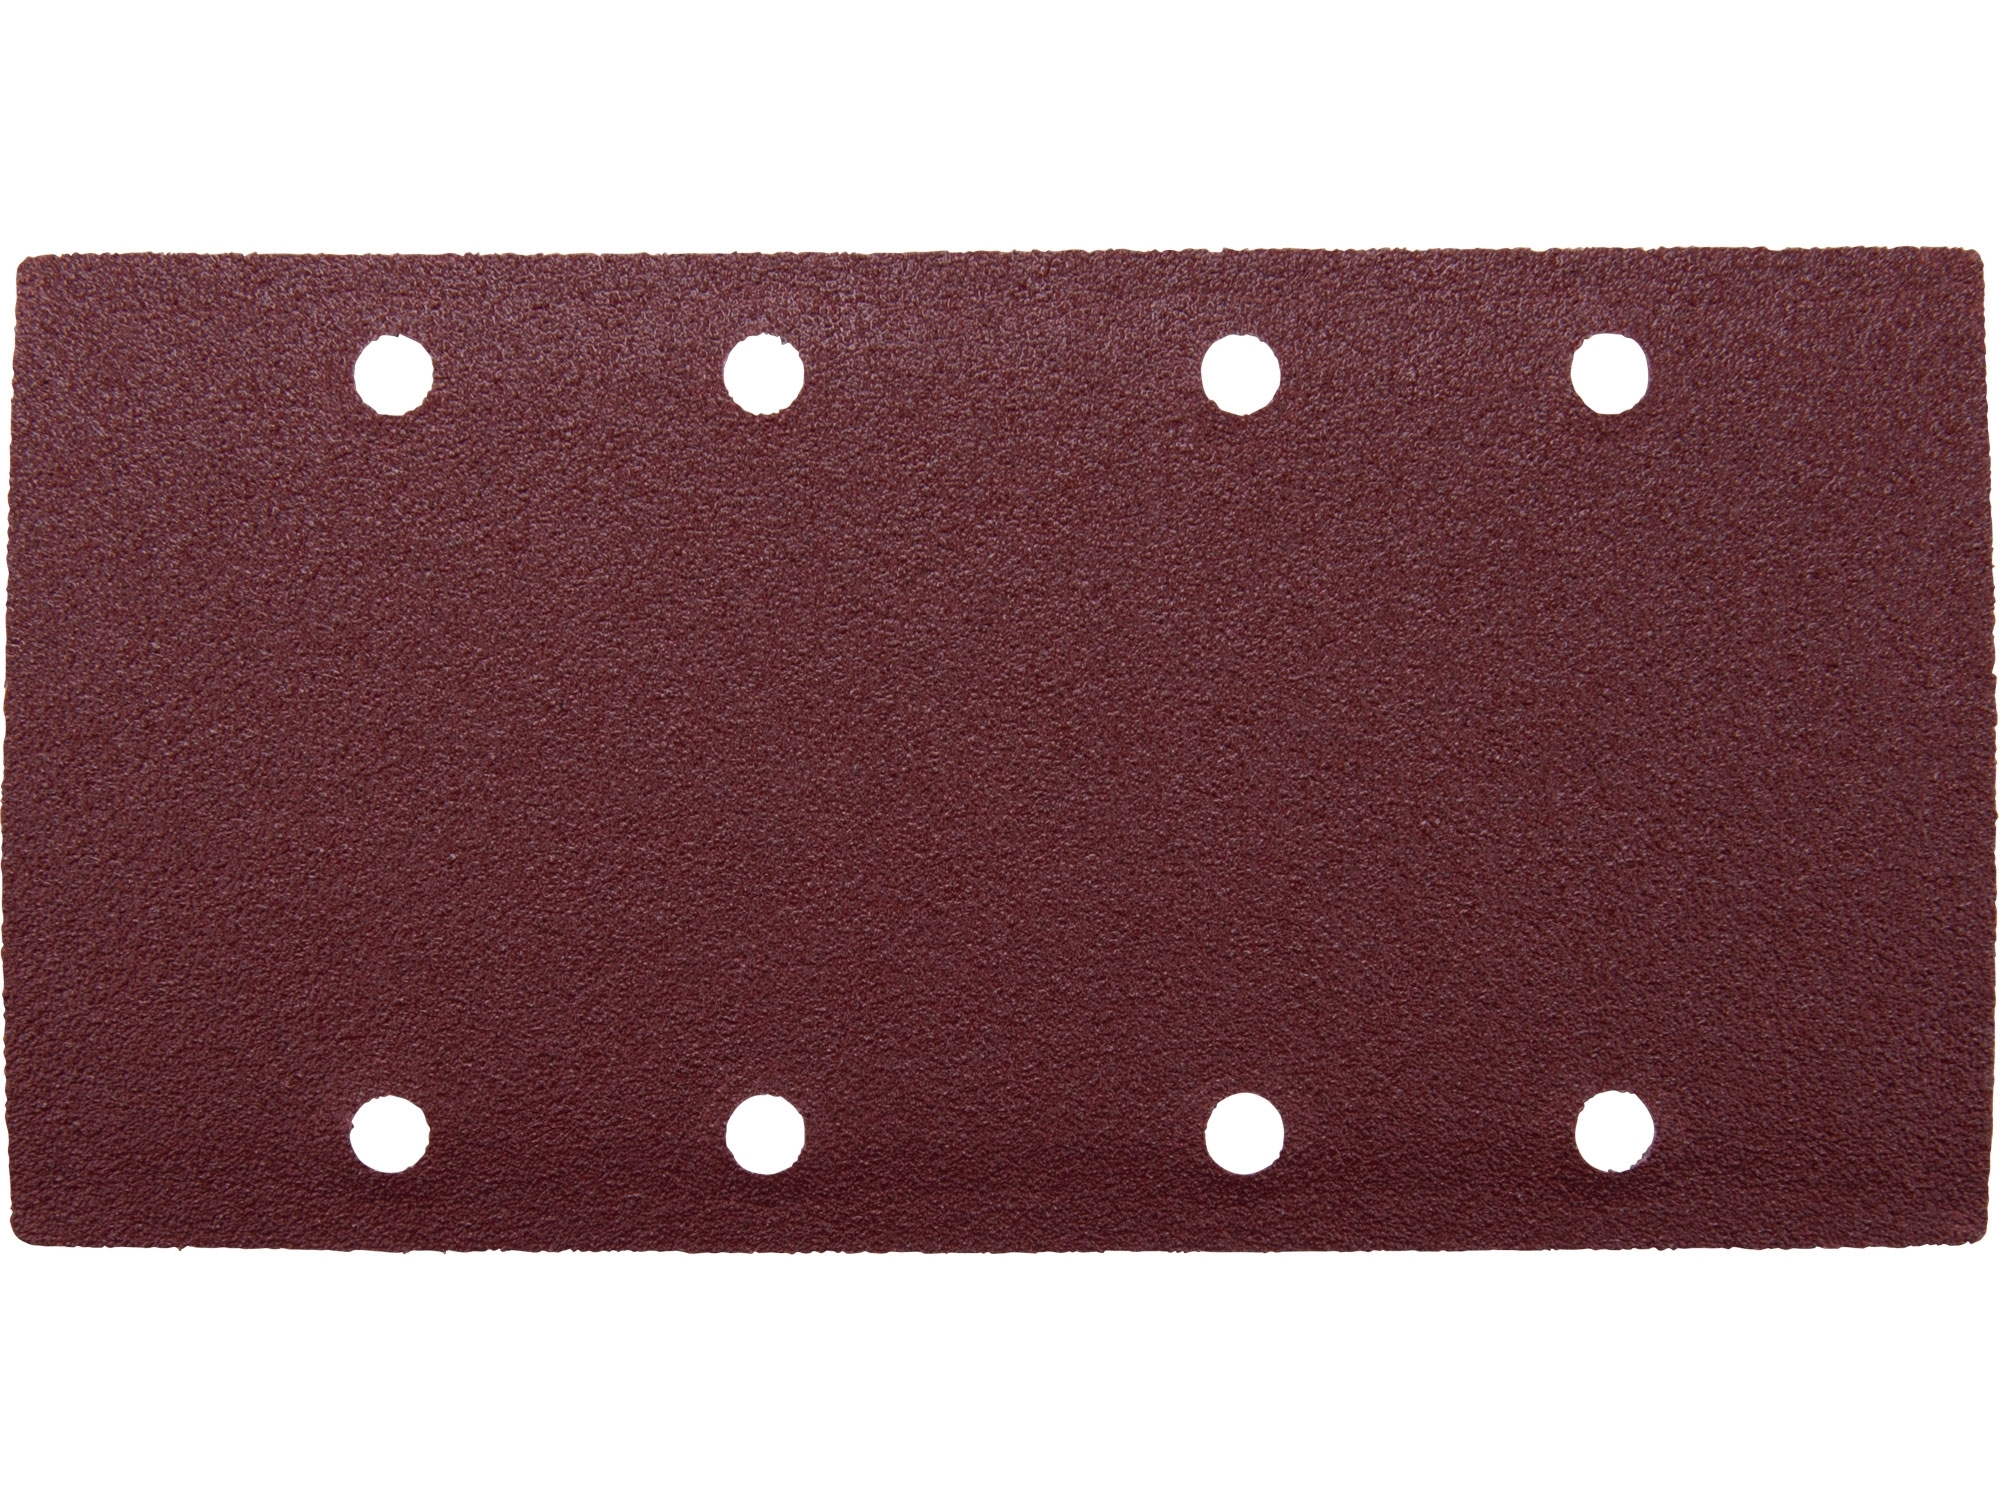 papíry brusné, suchý zip, bal. 10ks, 93x185mm, P80